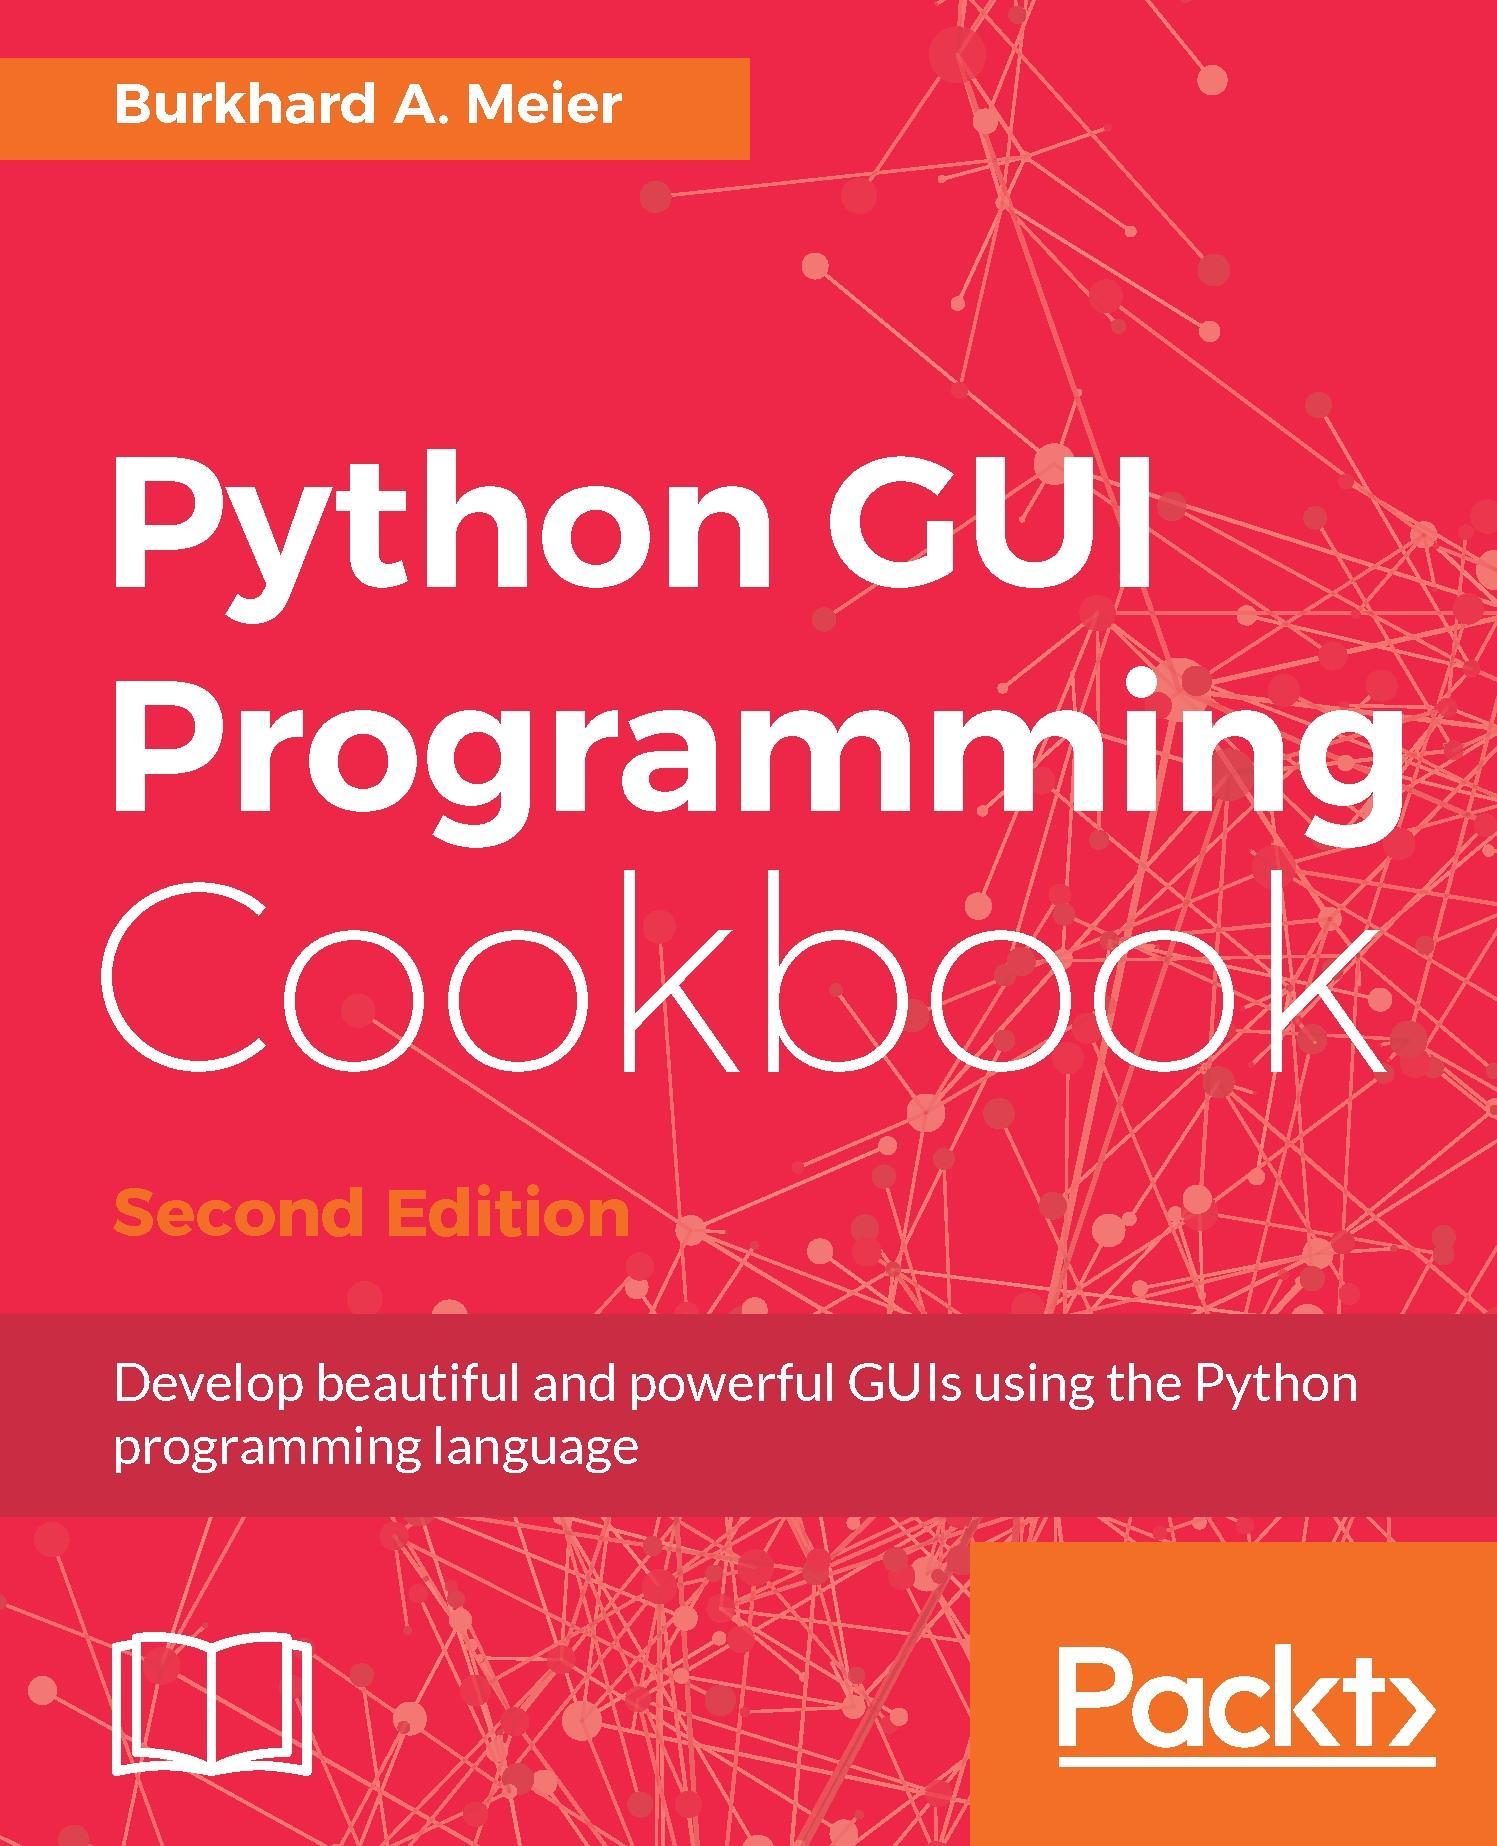 Python GUI Programming Cookbook - Second Edition